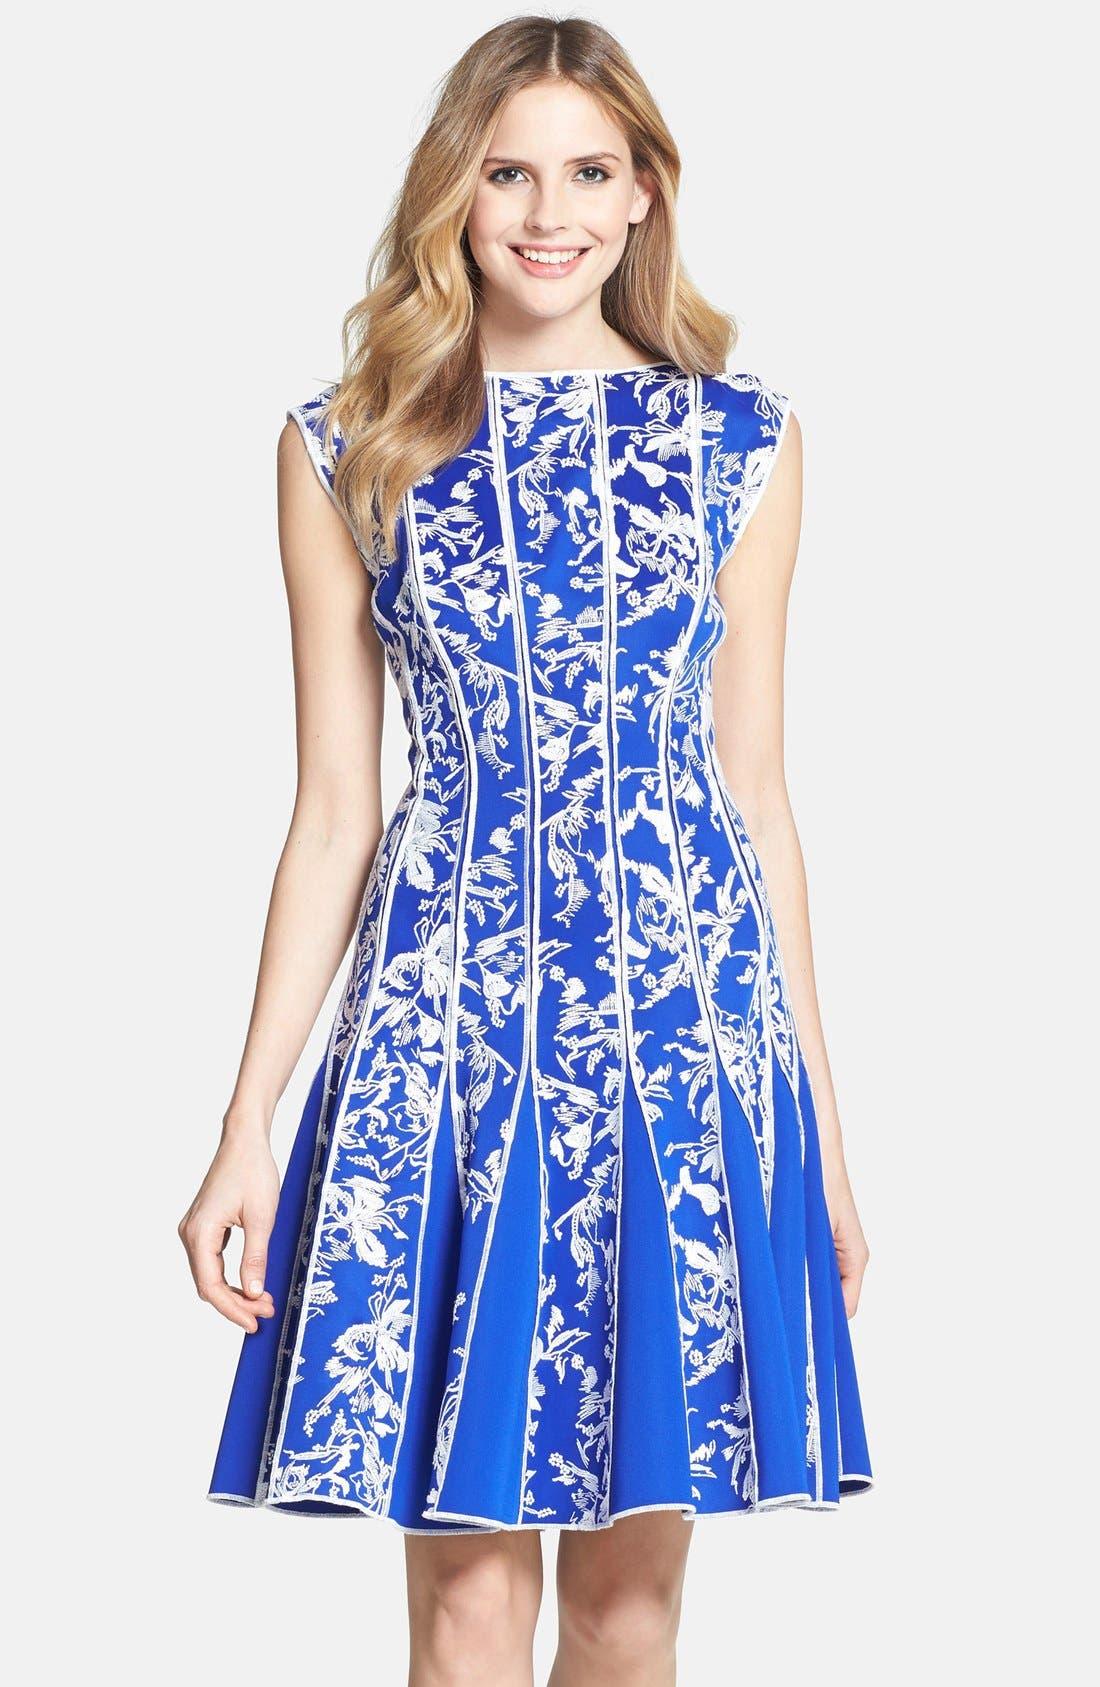 Alternate Image 1 Selected - Tadashi Shoji Embroidered Neoprene Fit & Flare Dress